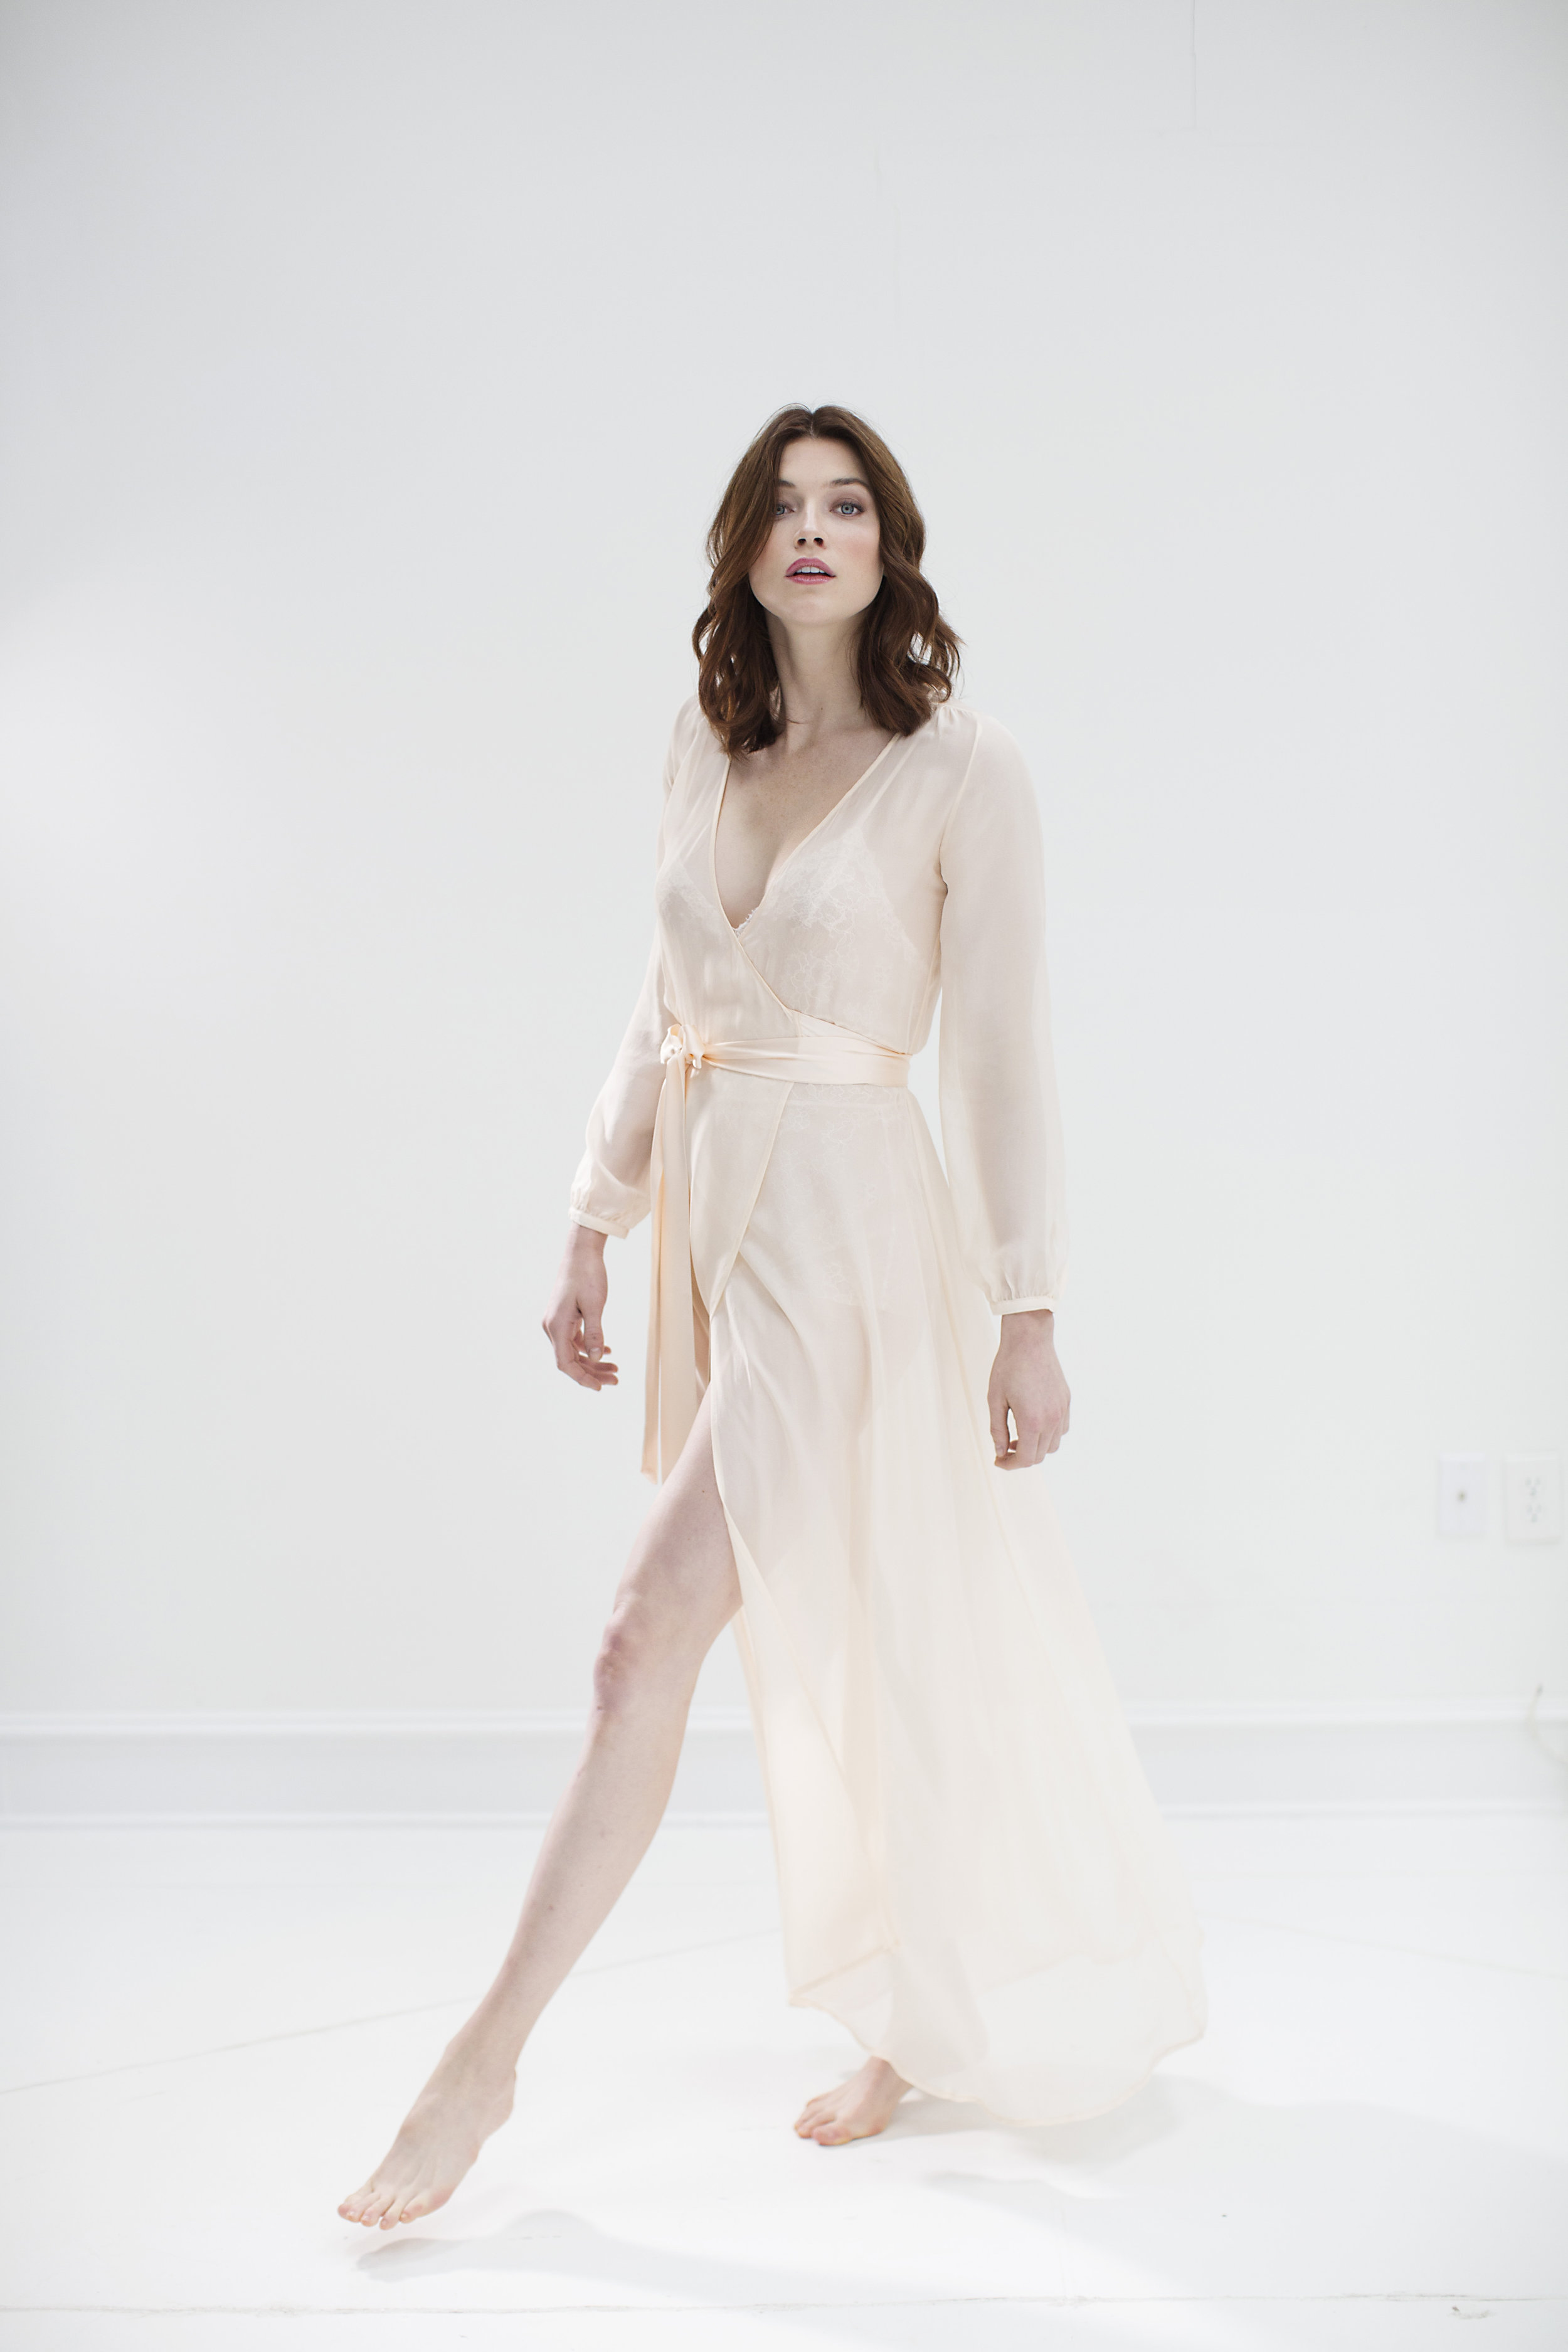 Nina Silk Chiffon robe in blush pink.jpg